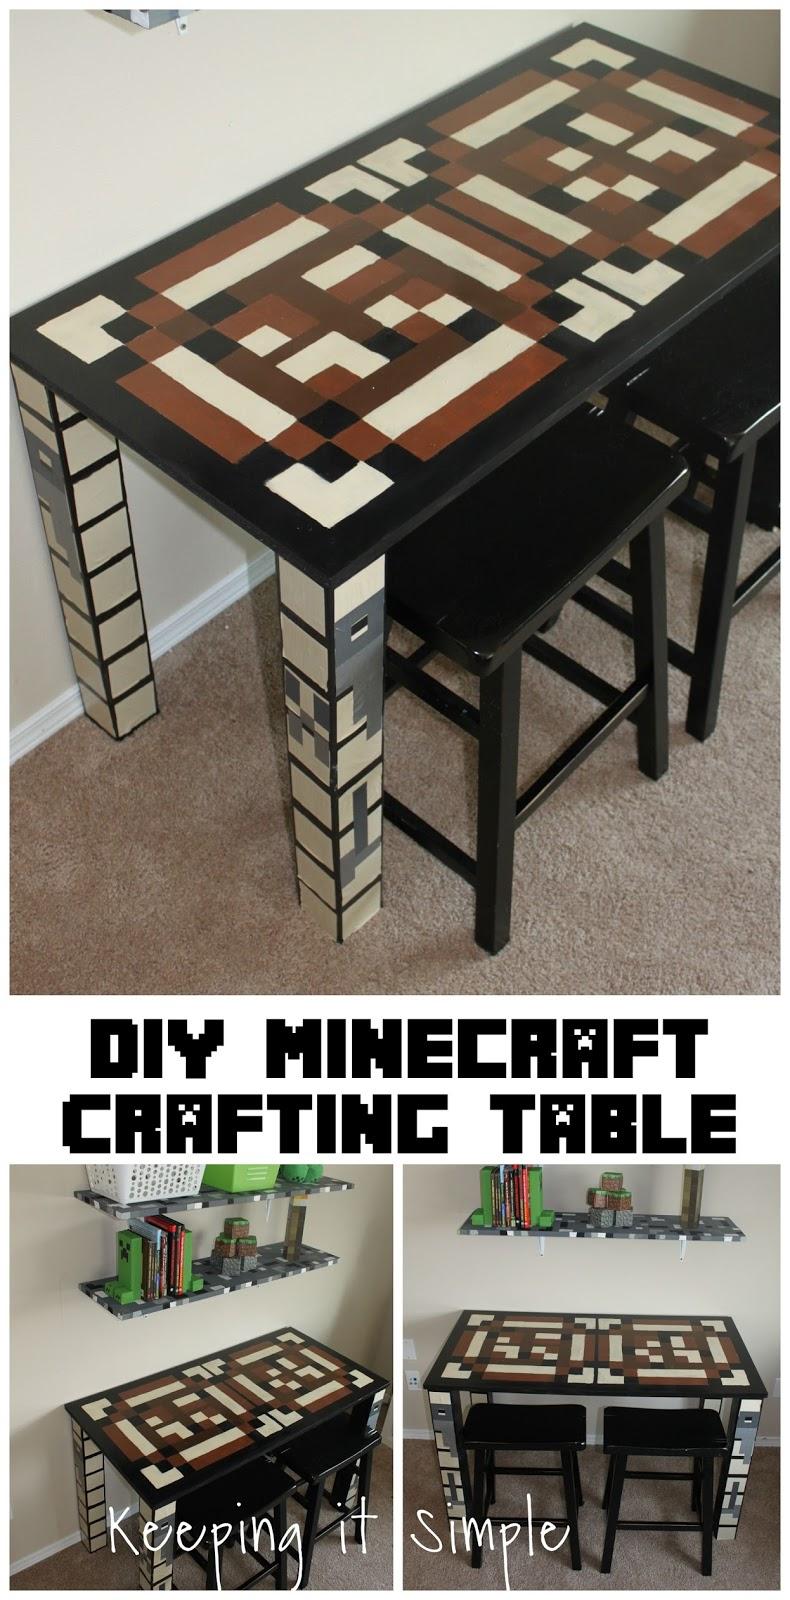 DIY Minecraft Crafting Table